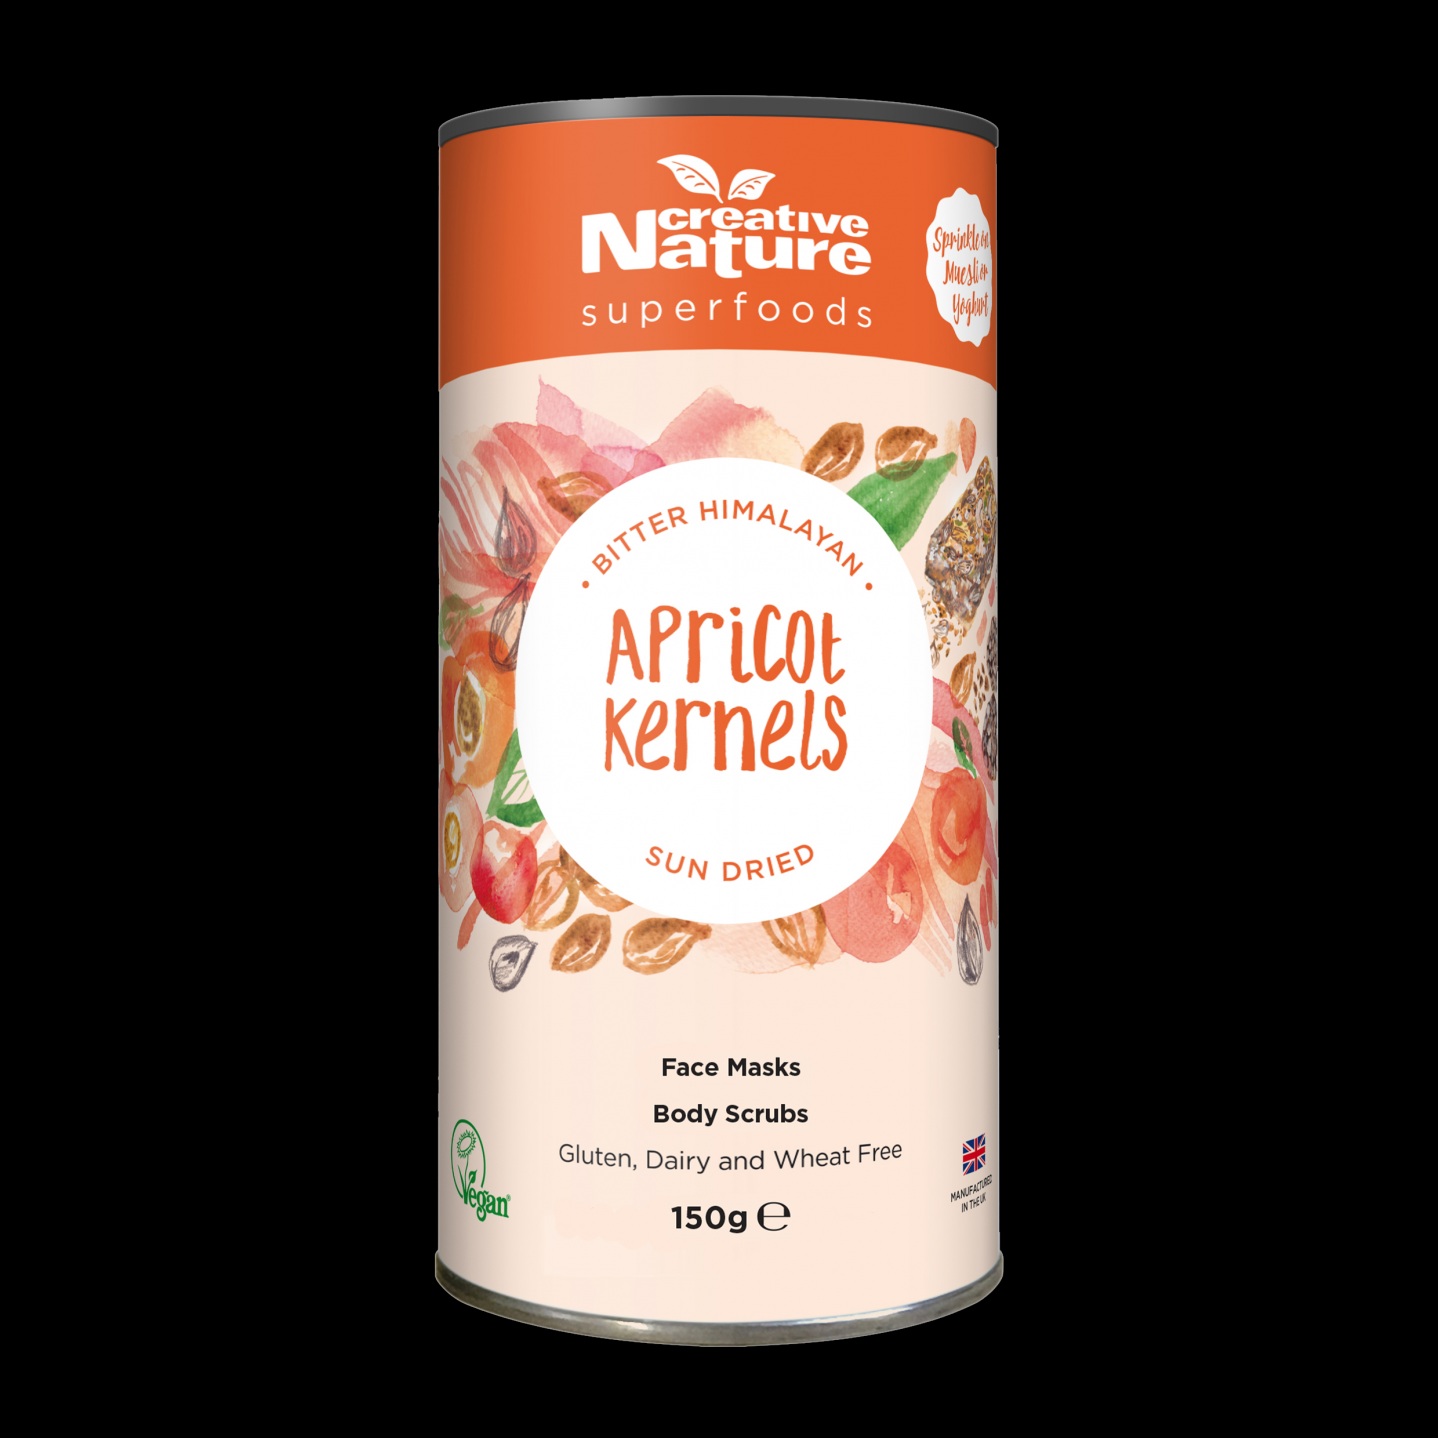 Apricot Kernels 150g